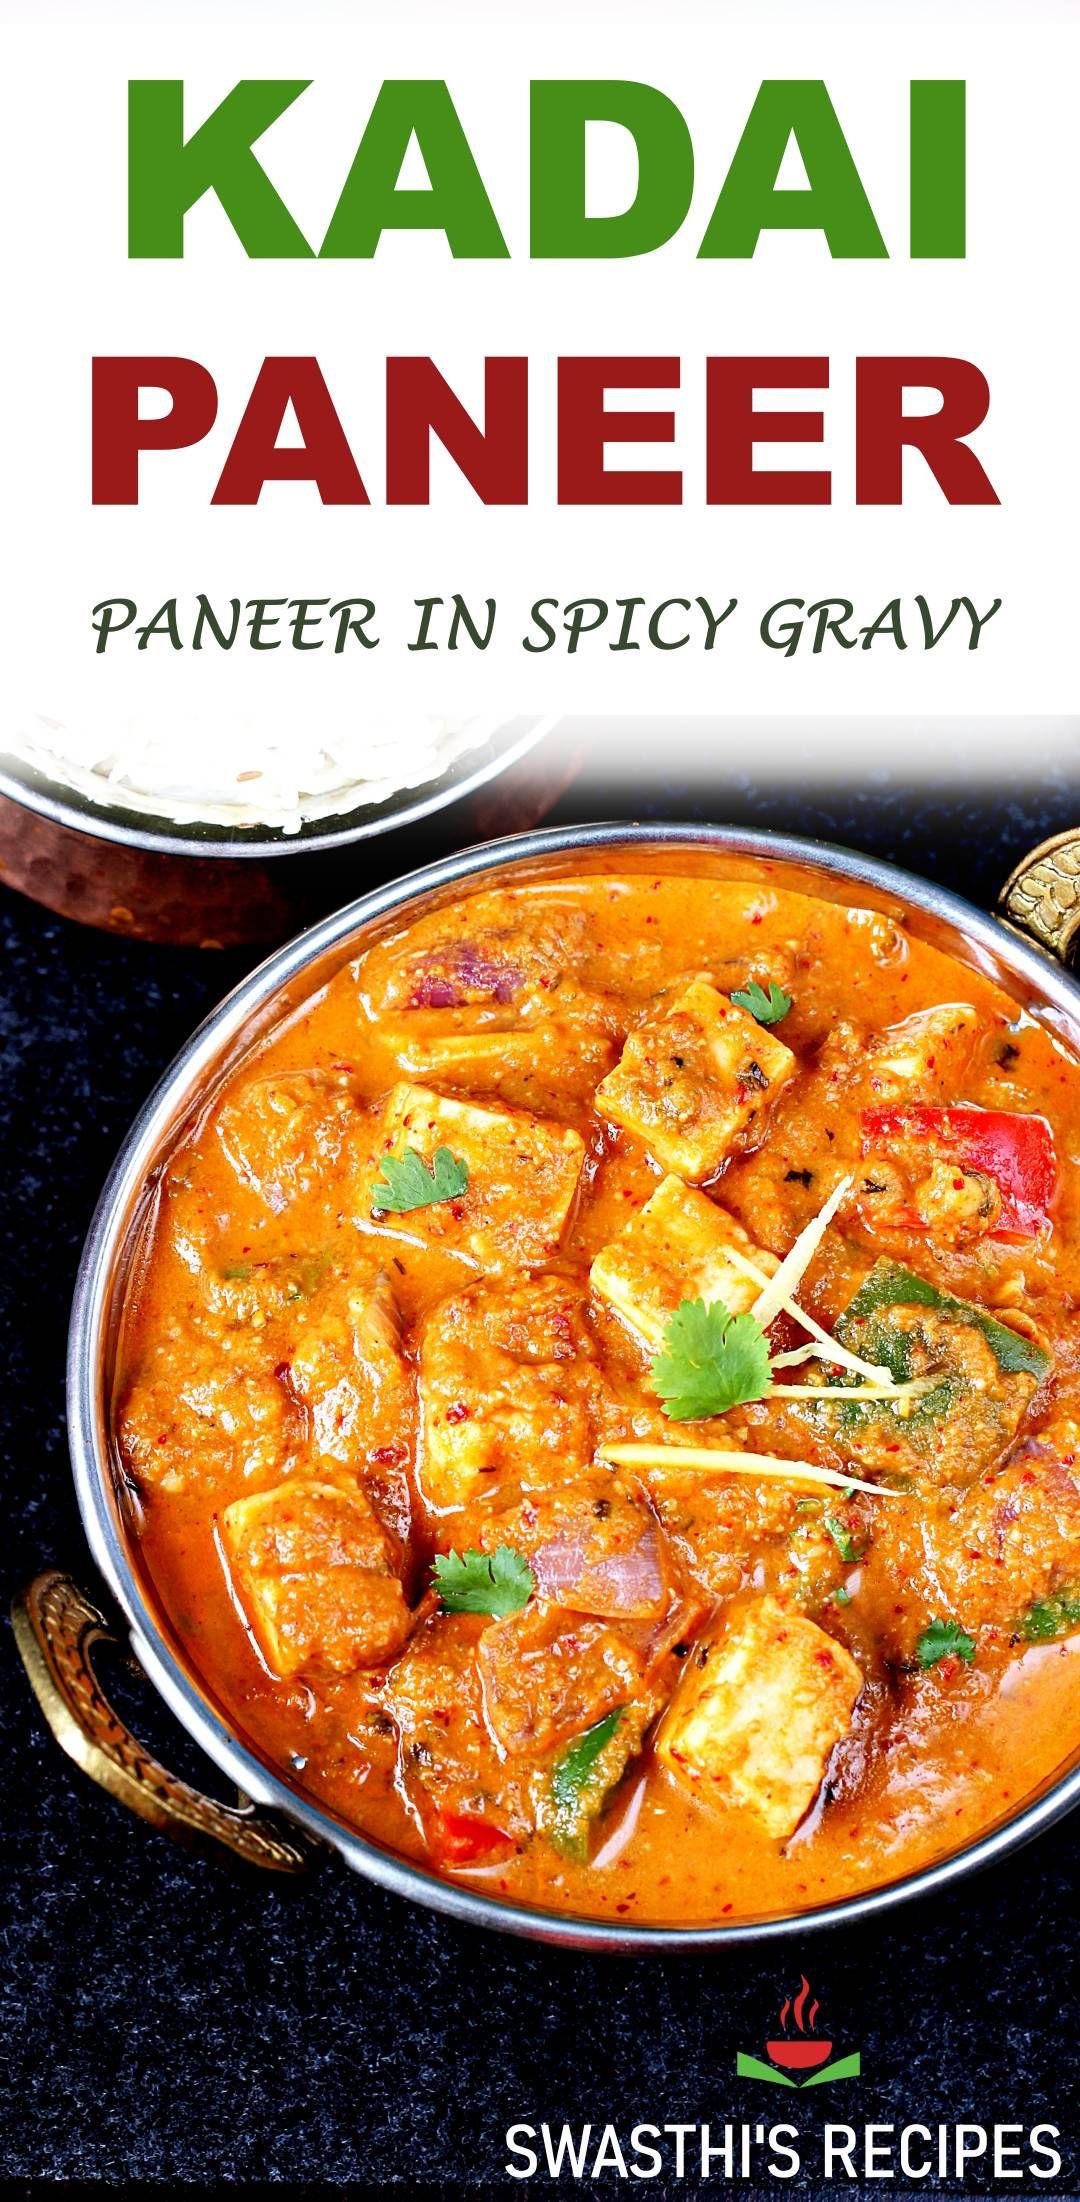 kadai paneer recipe how to make kadai paneer gravy dry recipe in 2020 recipes indian on hebbar s kitchen kadai paneer id=46646